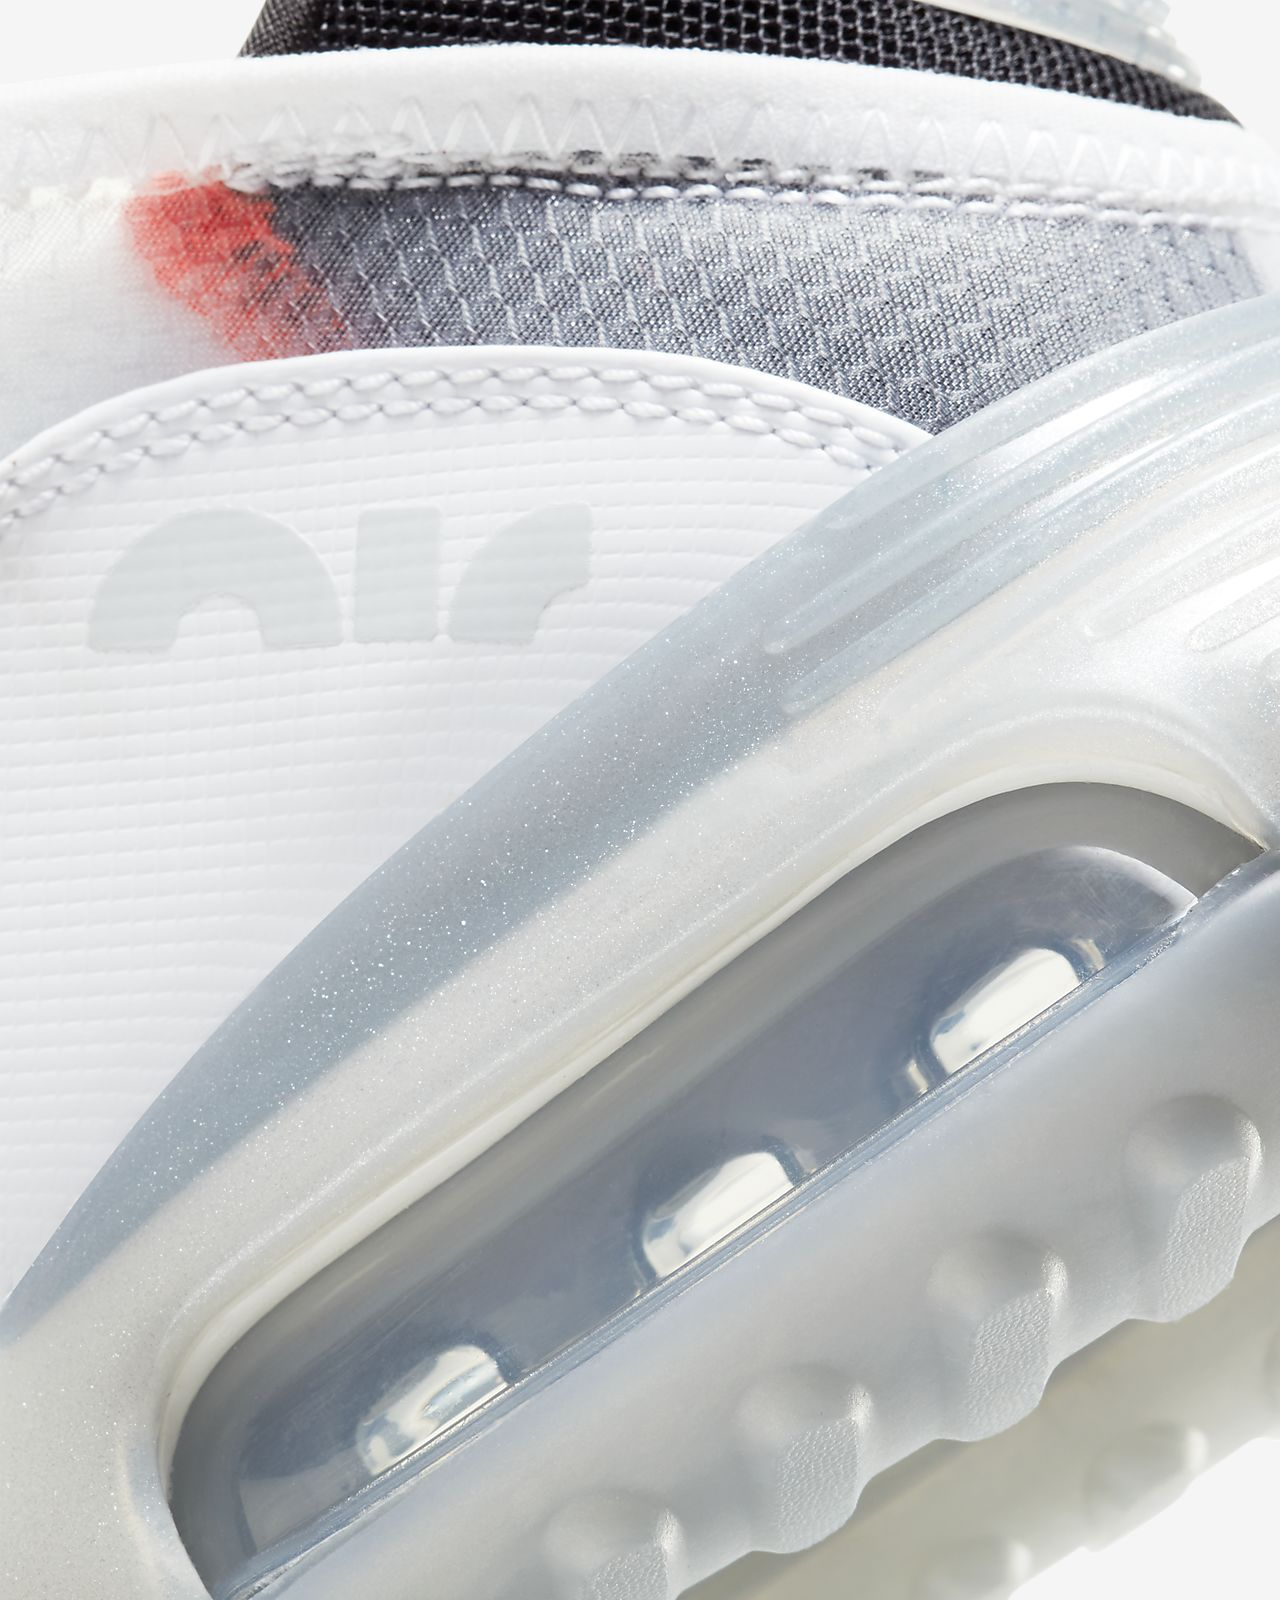 Nike Air Max Vapormax 2090 white black women Running Shoes